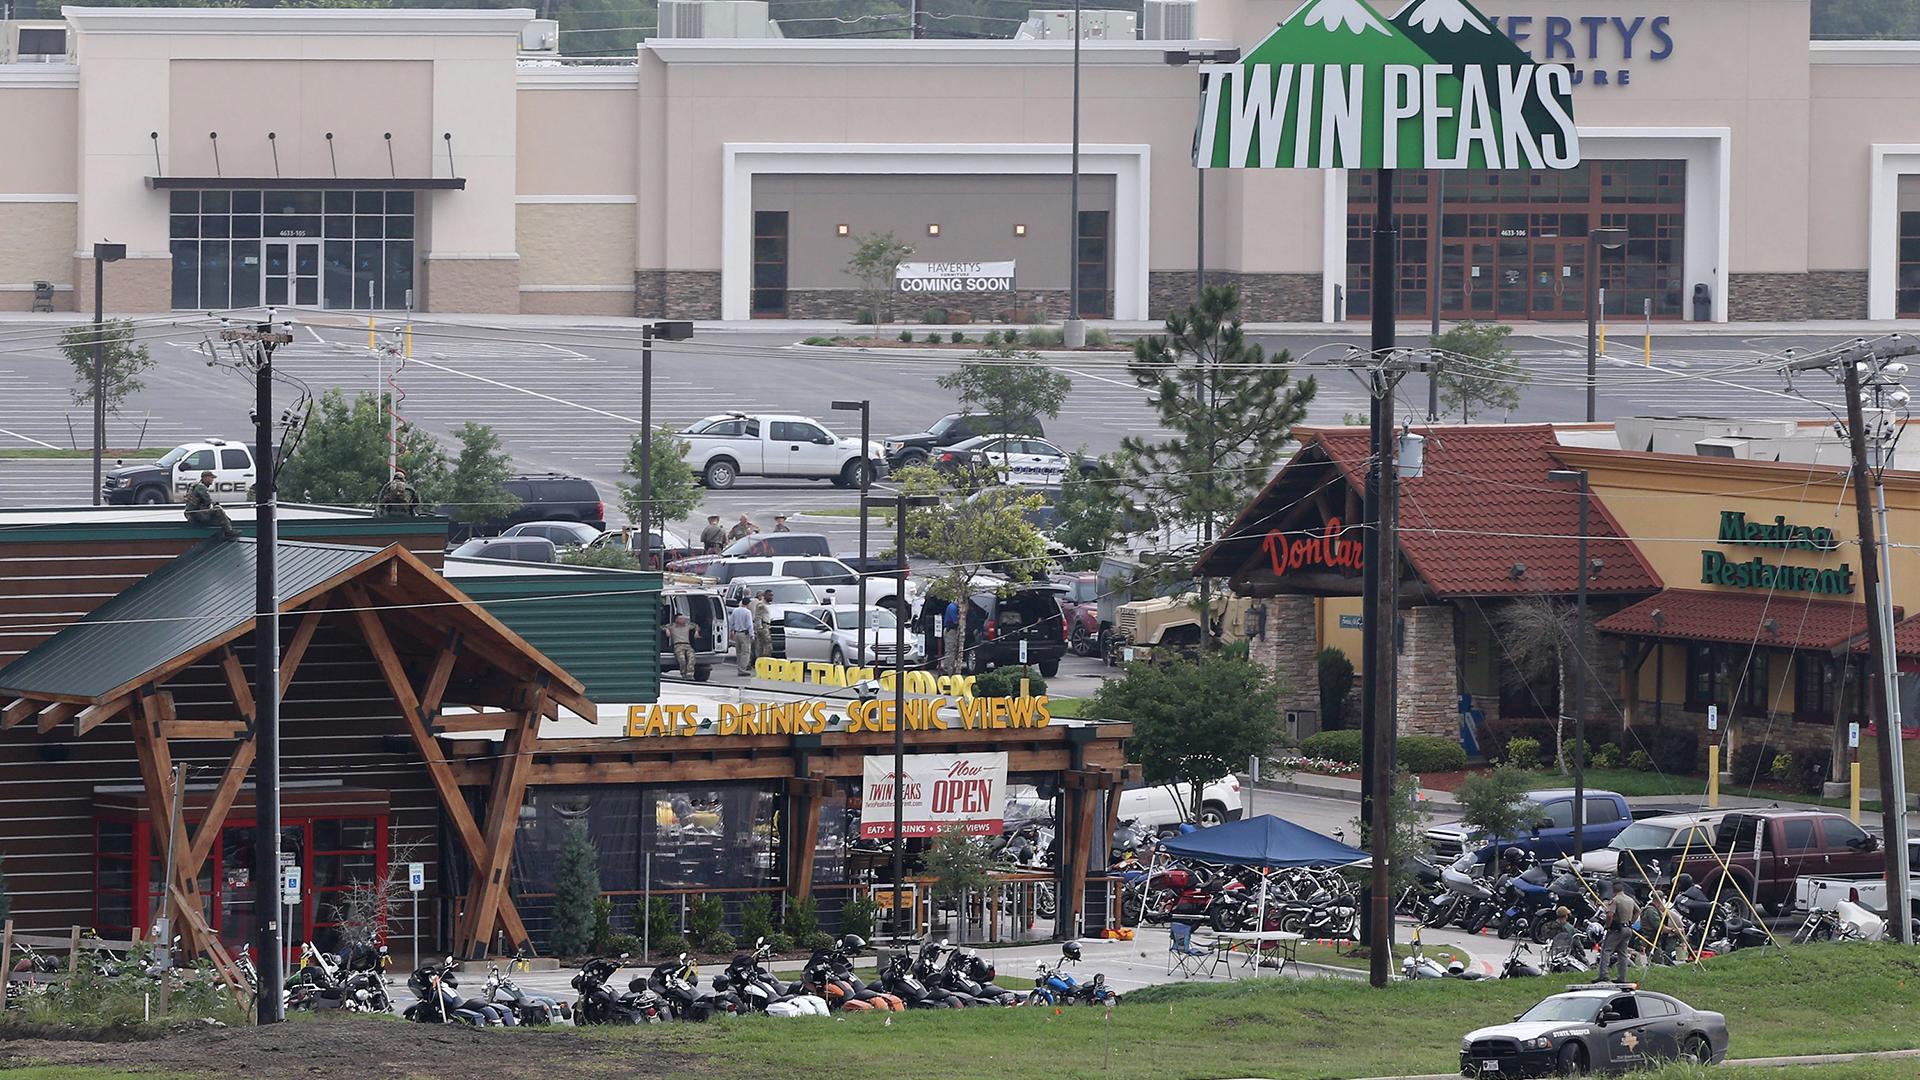 Waco Biker Brawl: Scores Arrested After Shootout at Twin Peaks Bar